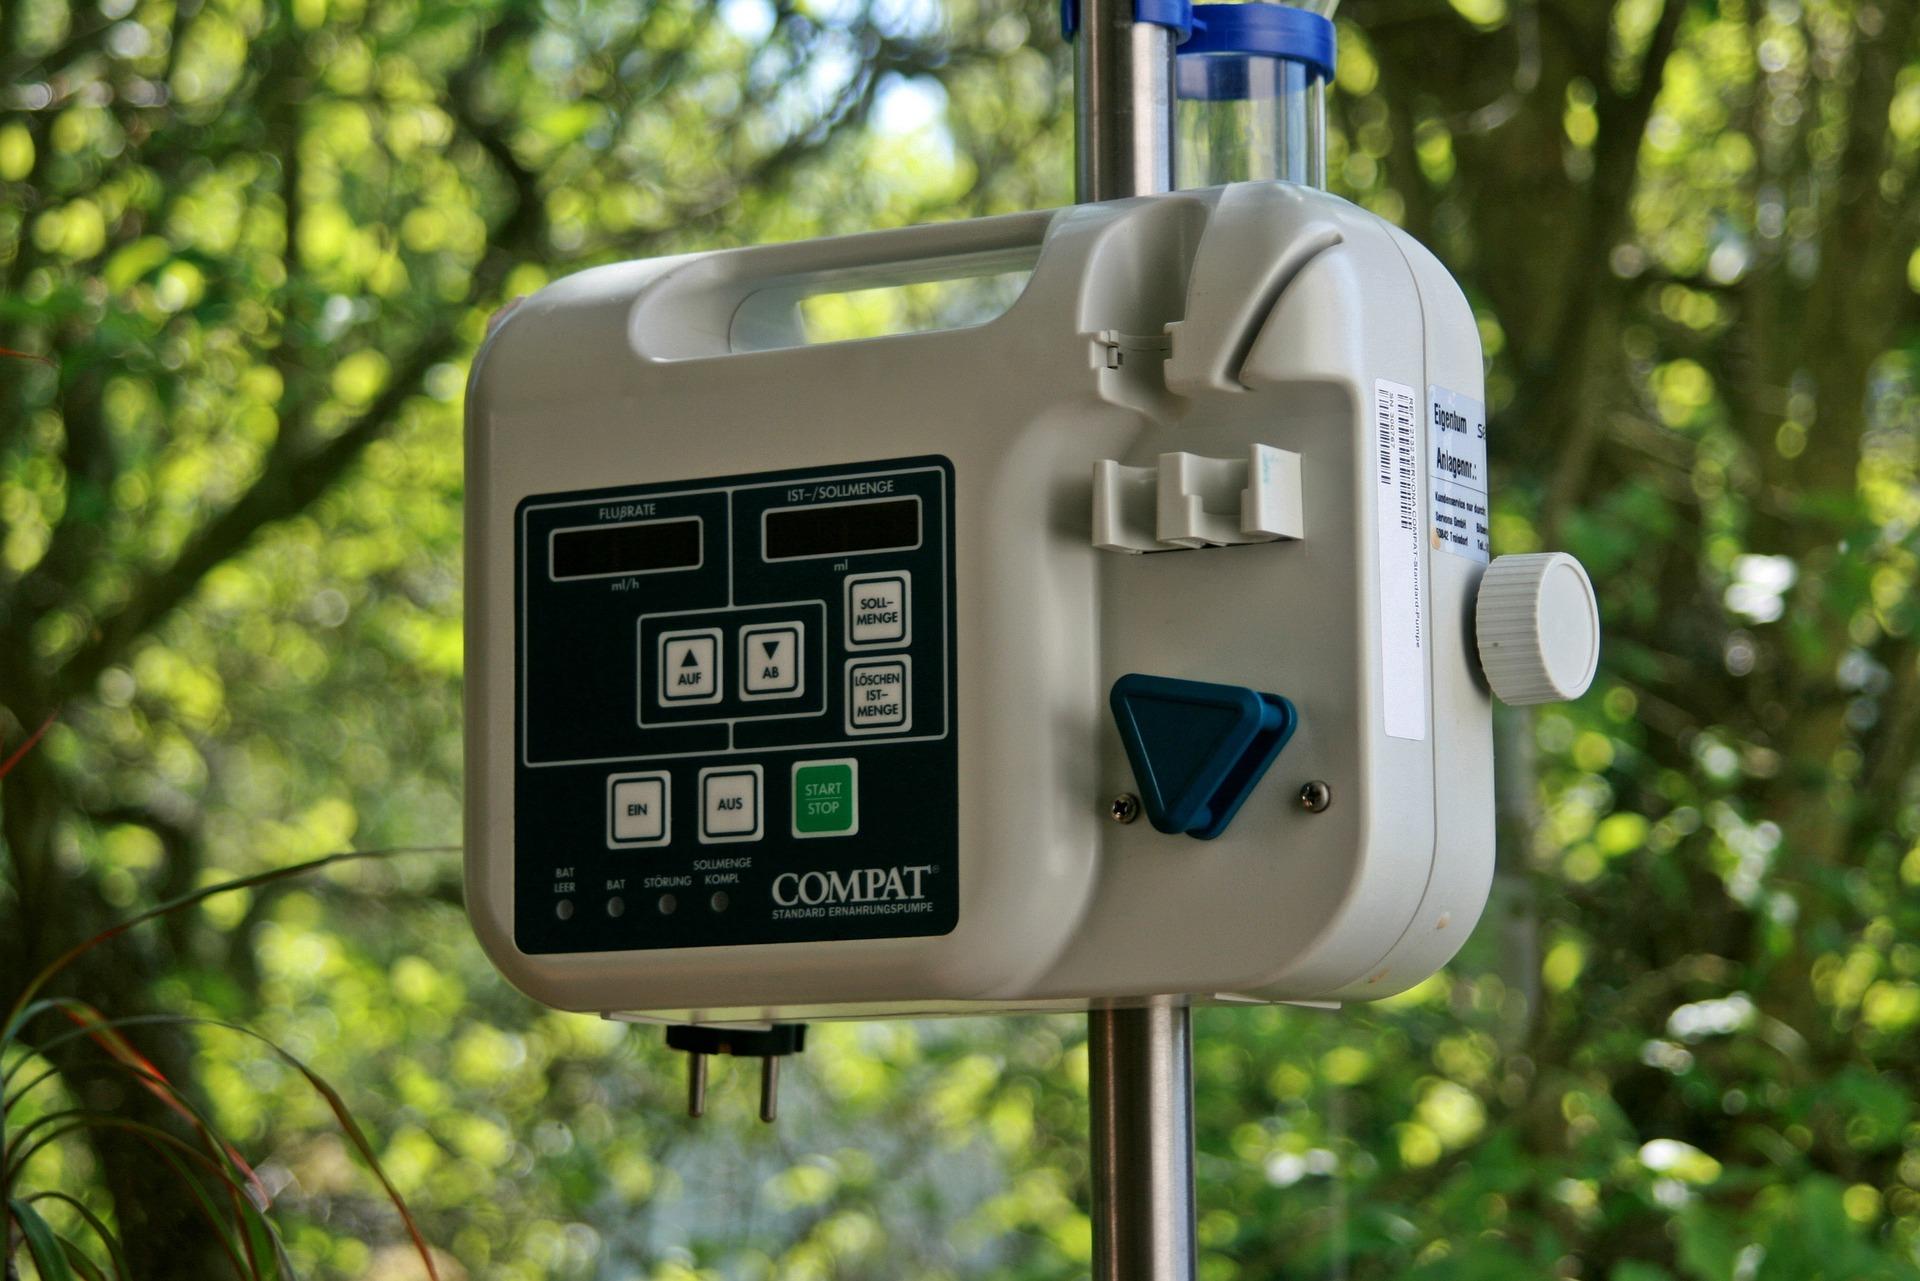 probe-pump-330600_1920